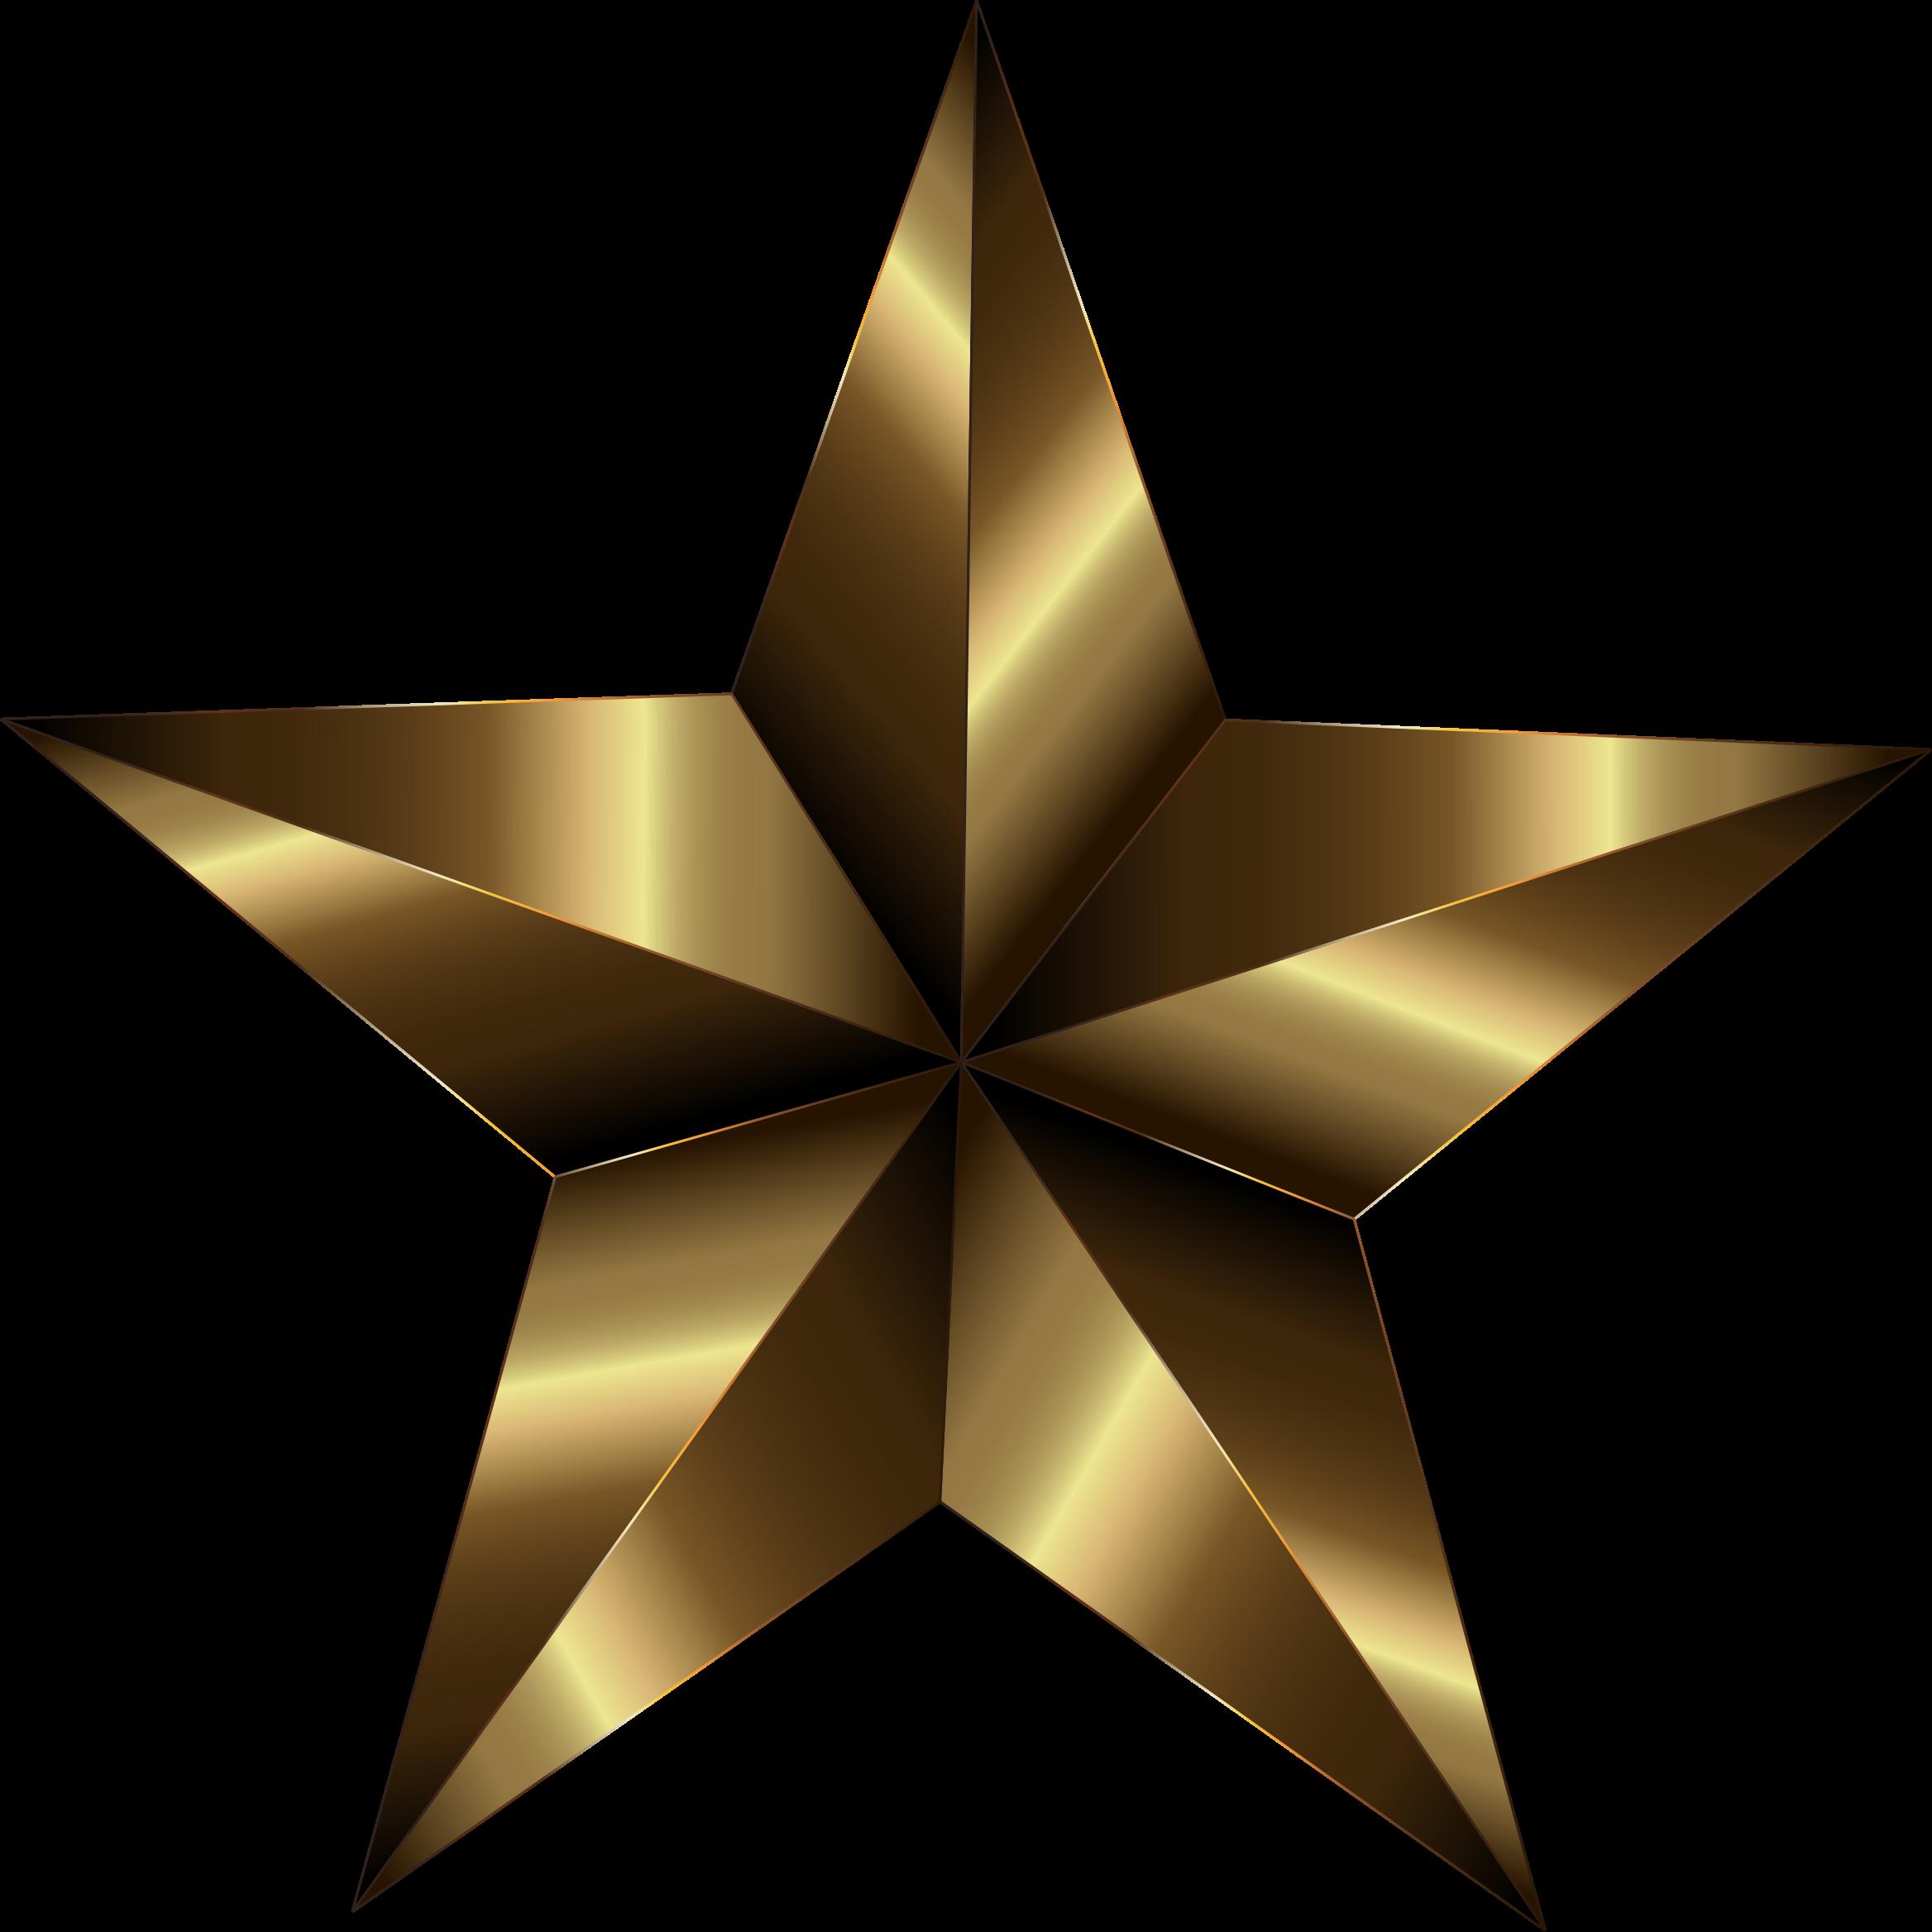 Brown star clipart jpg transparent download Clipart - Prismatic Star 20 jpg transparent download